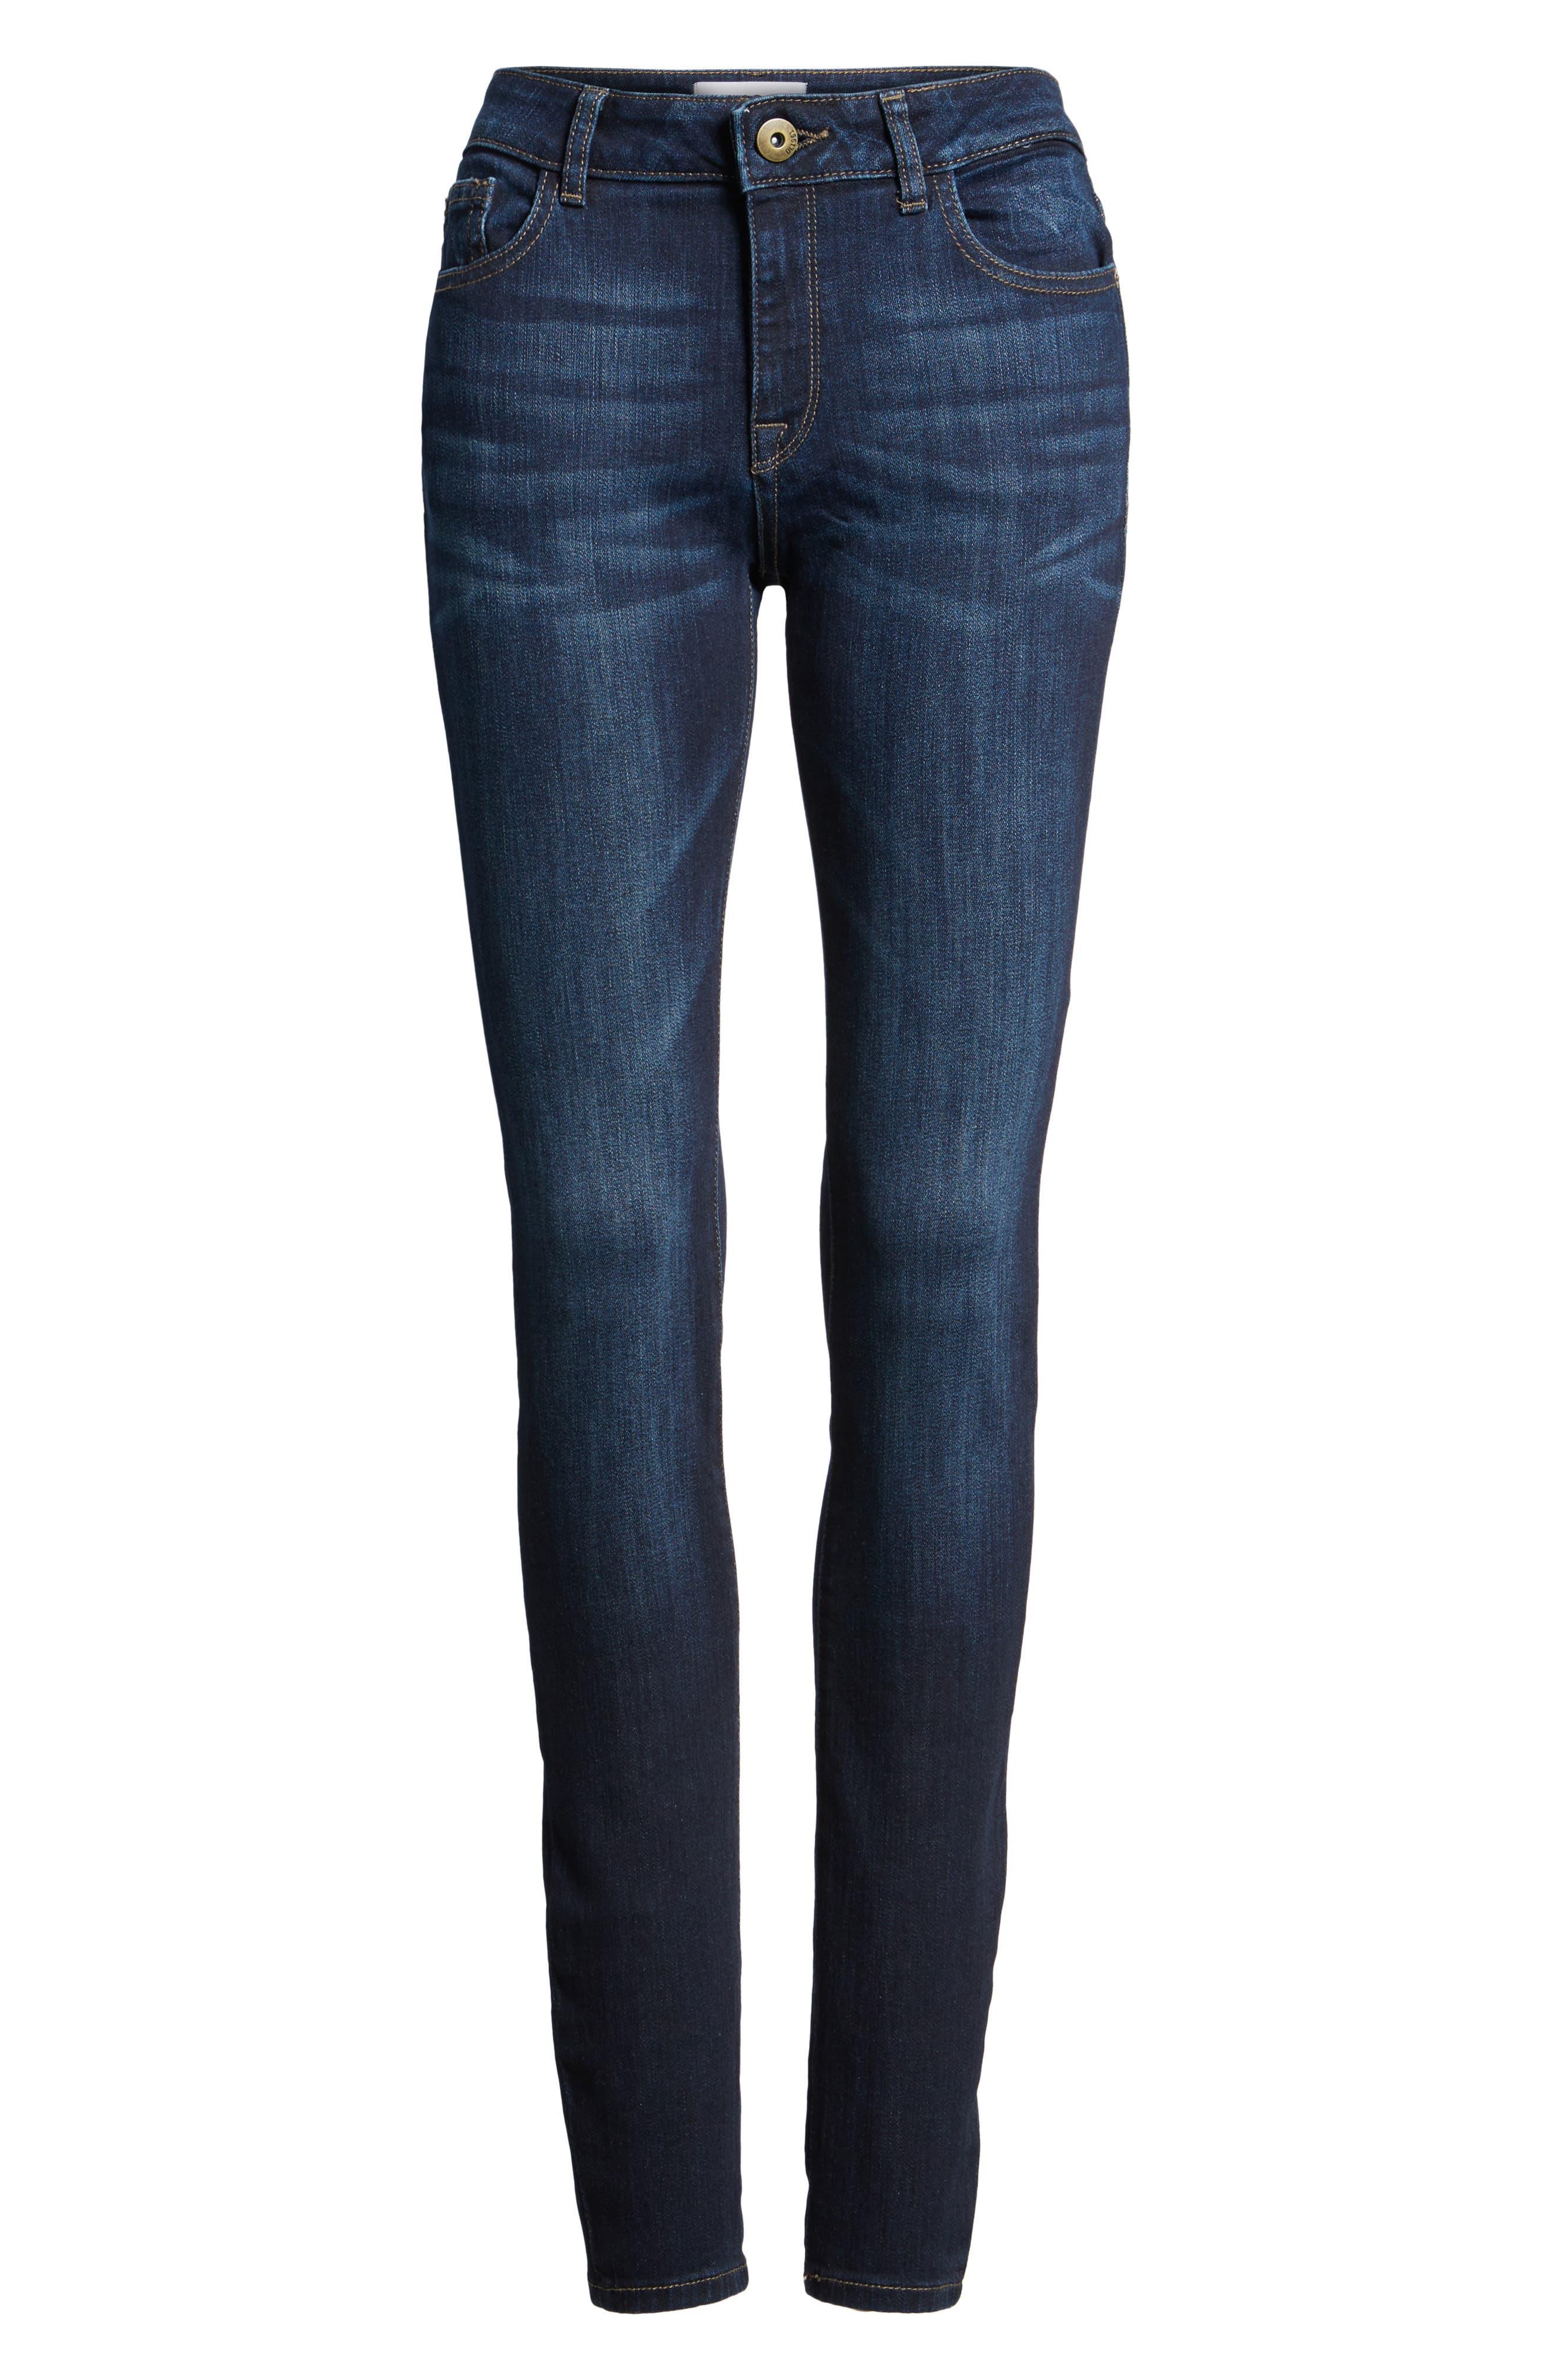 'Danny' Instasculpt Skinny Jeans,                             Alternate thumbnail 2, color,                             PULSE